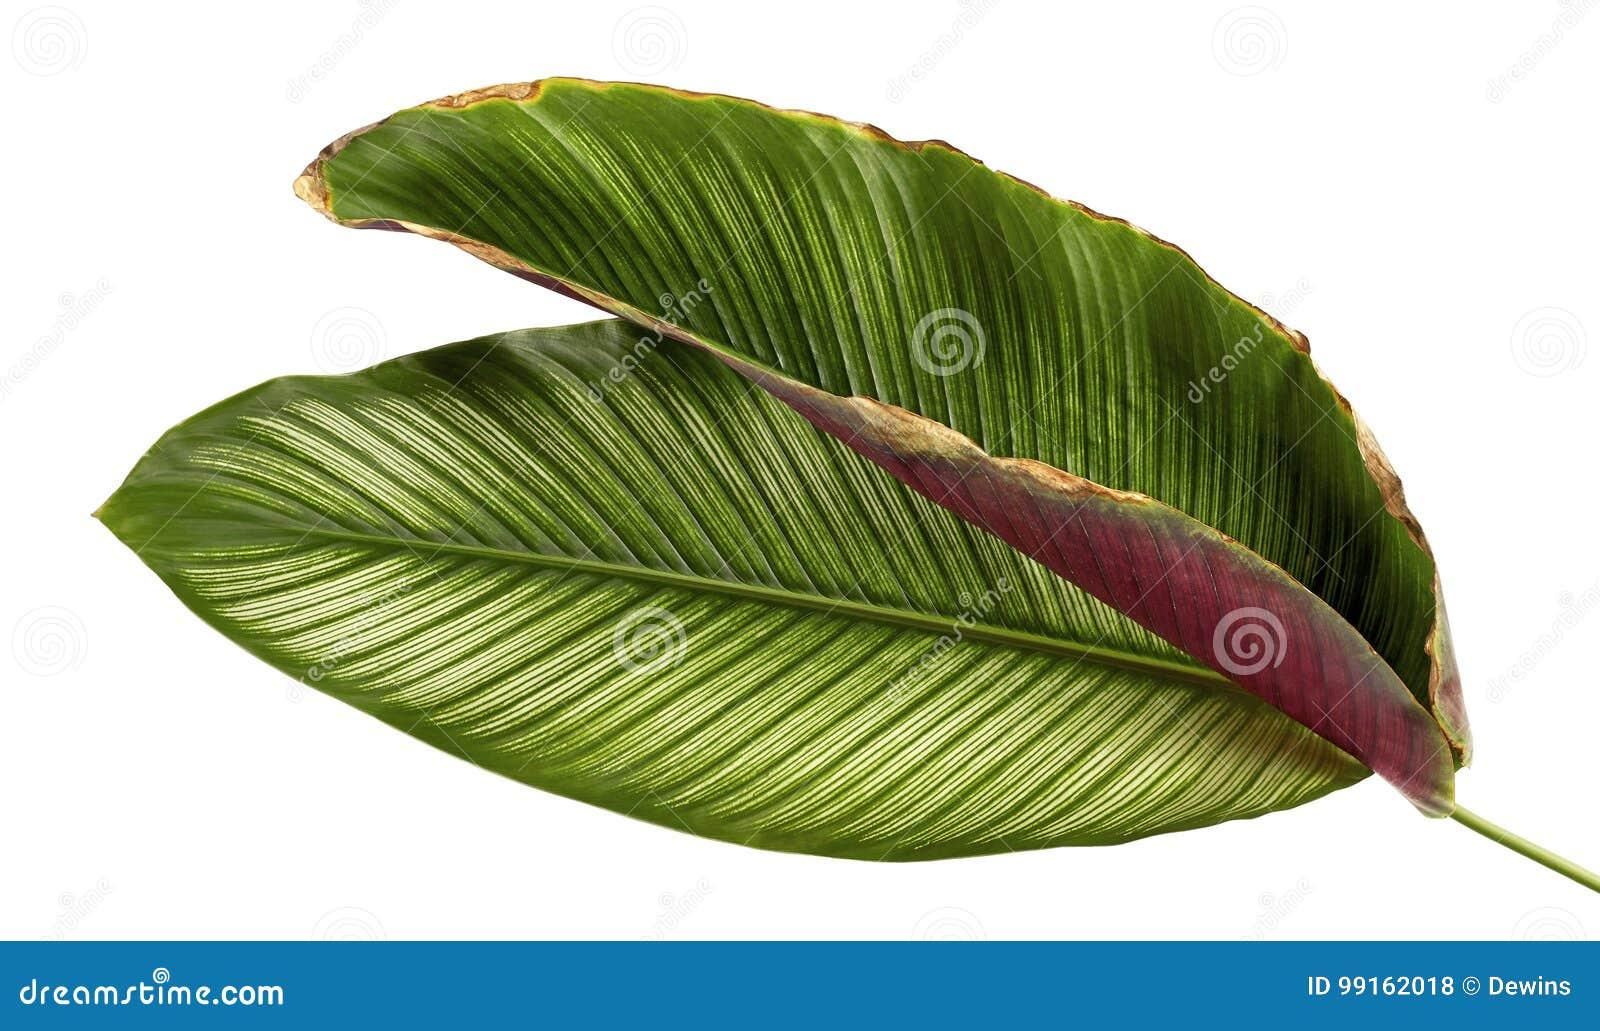 Calathea ornataStift-band Calathea sidor, tropisk lövverk som isoleras på vit bakgrund